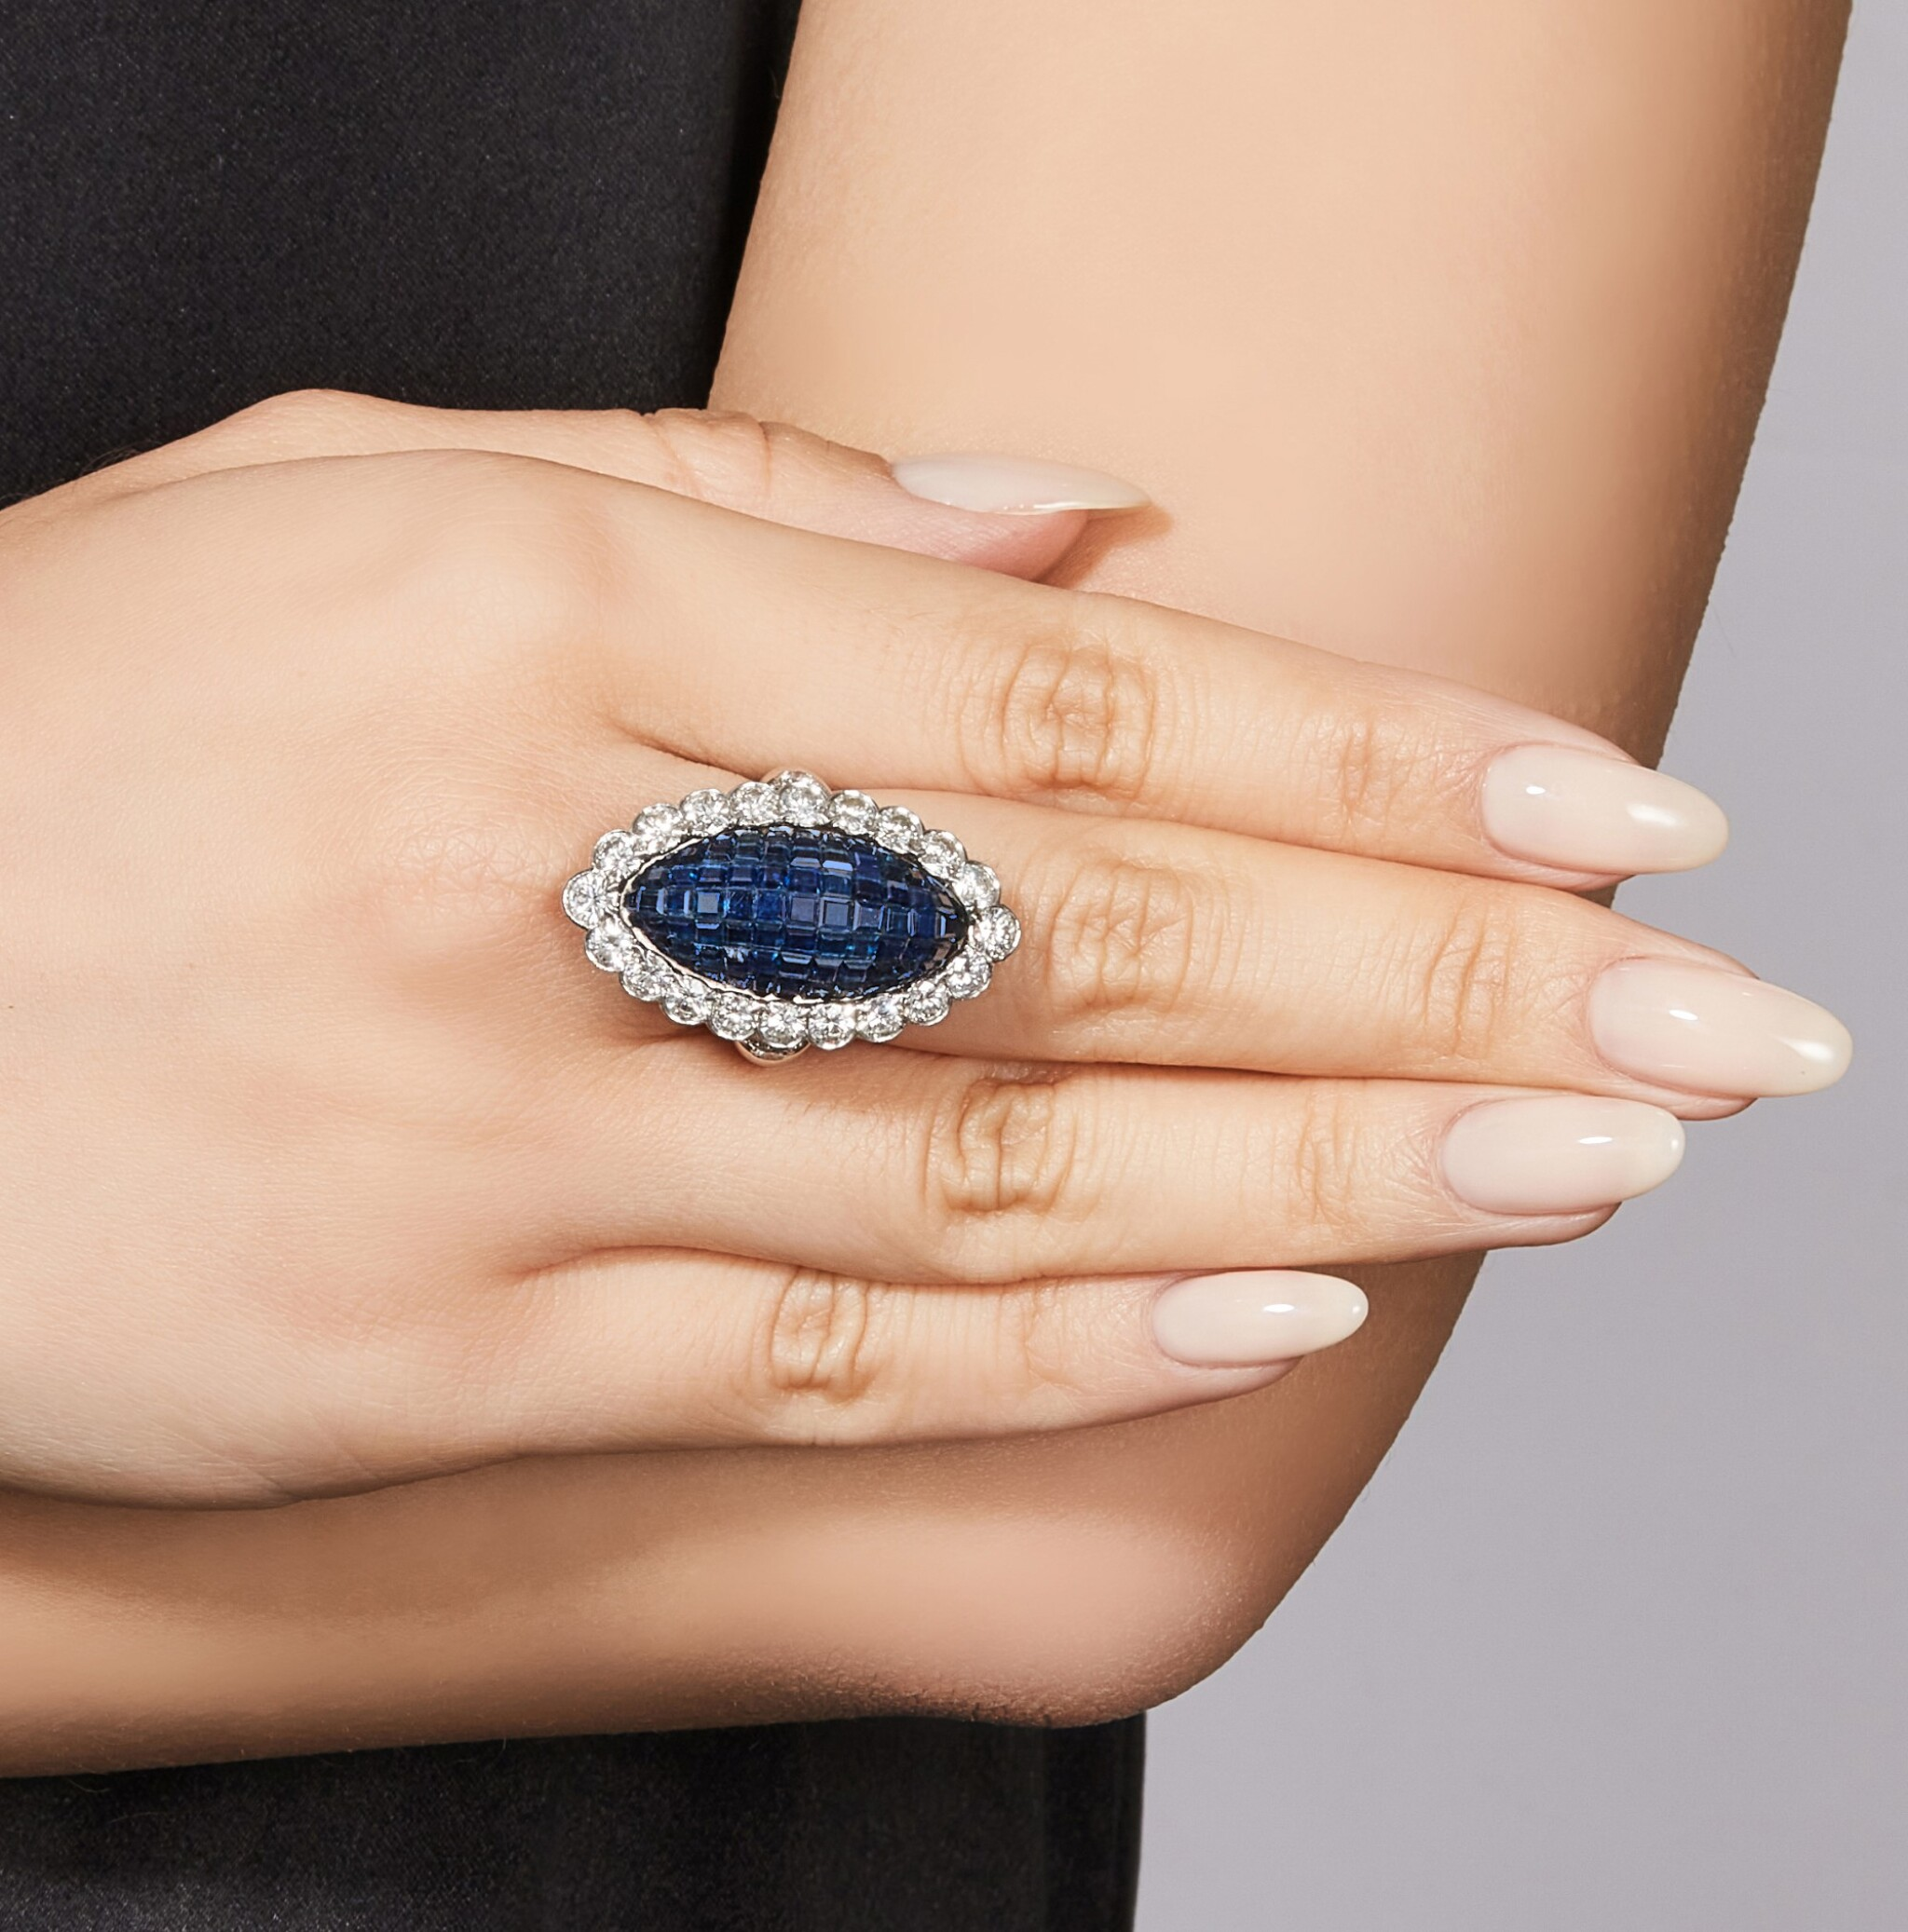 View full screen - View 1 of Lot 1601. VAN CLEEF & ARPELS | SAPPHIRE AND DIAMOND RING | 梵克雅寶 | 藍寶石 配 鑽石 戒指.